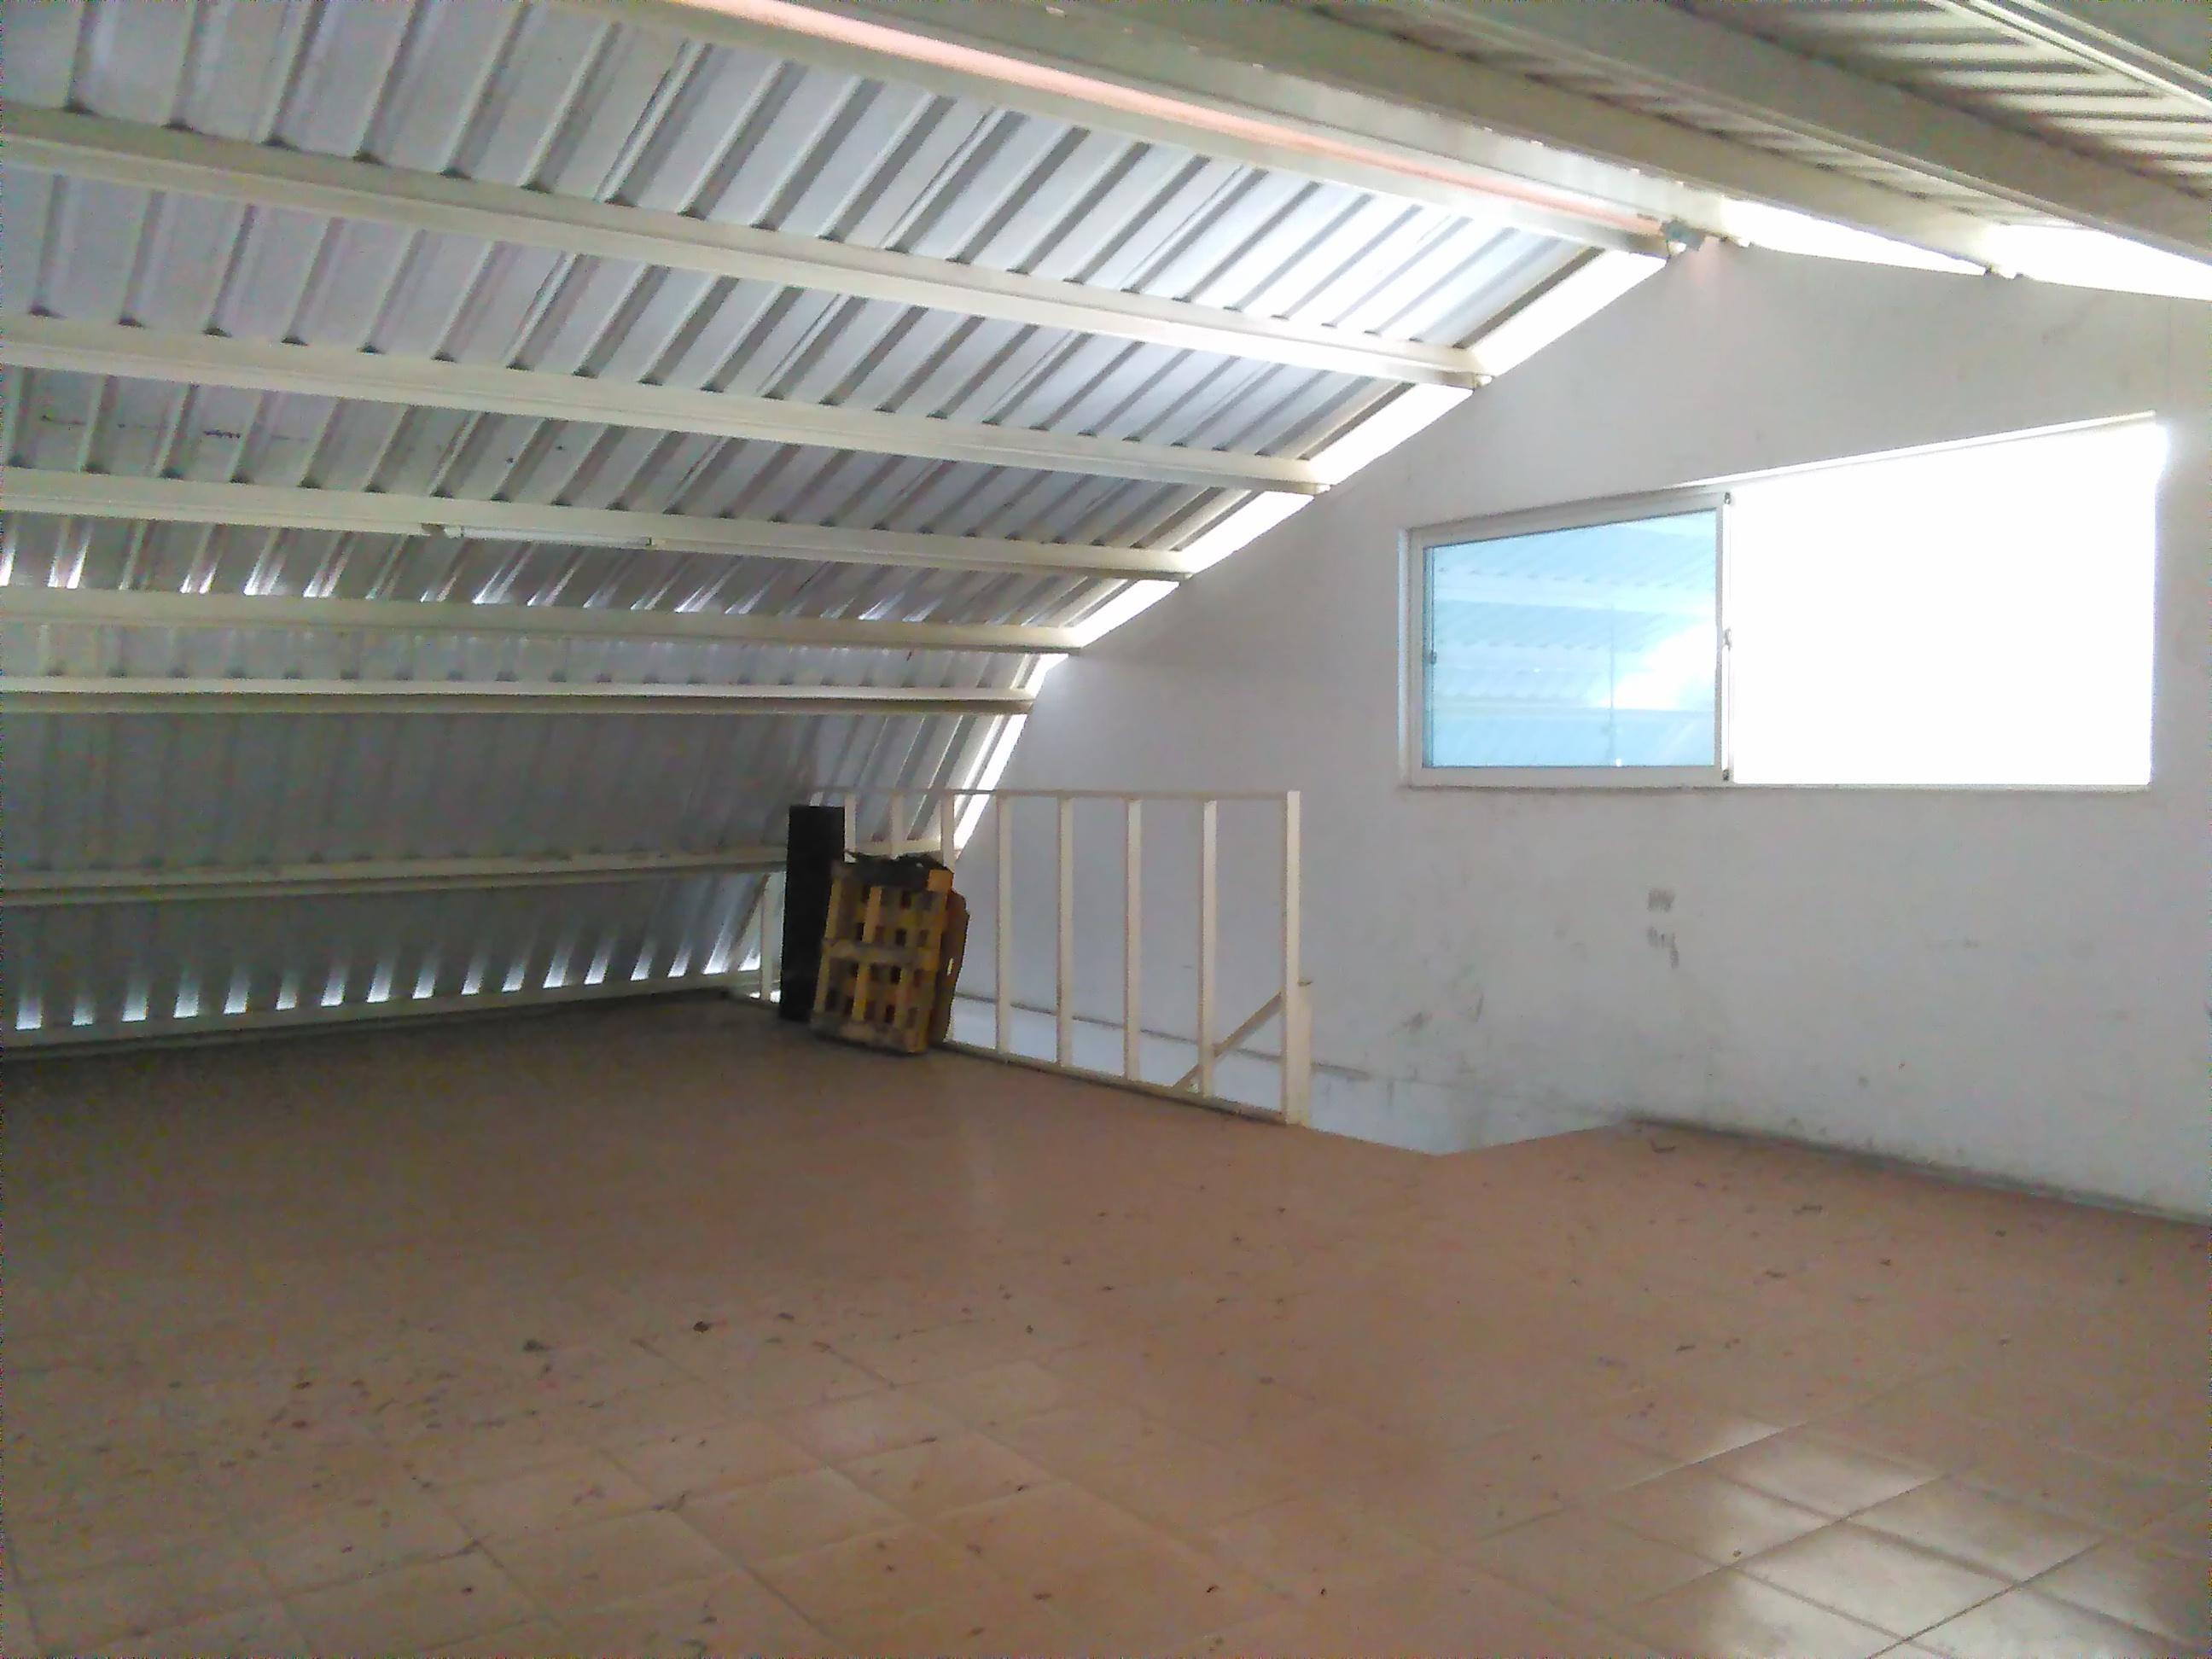 Local Comercial Lara>Barquisimeto>Centro - Alquiler:1.200 Precio Referencial - codigo: 19-7088